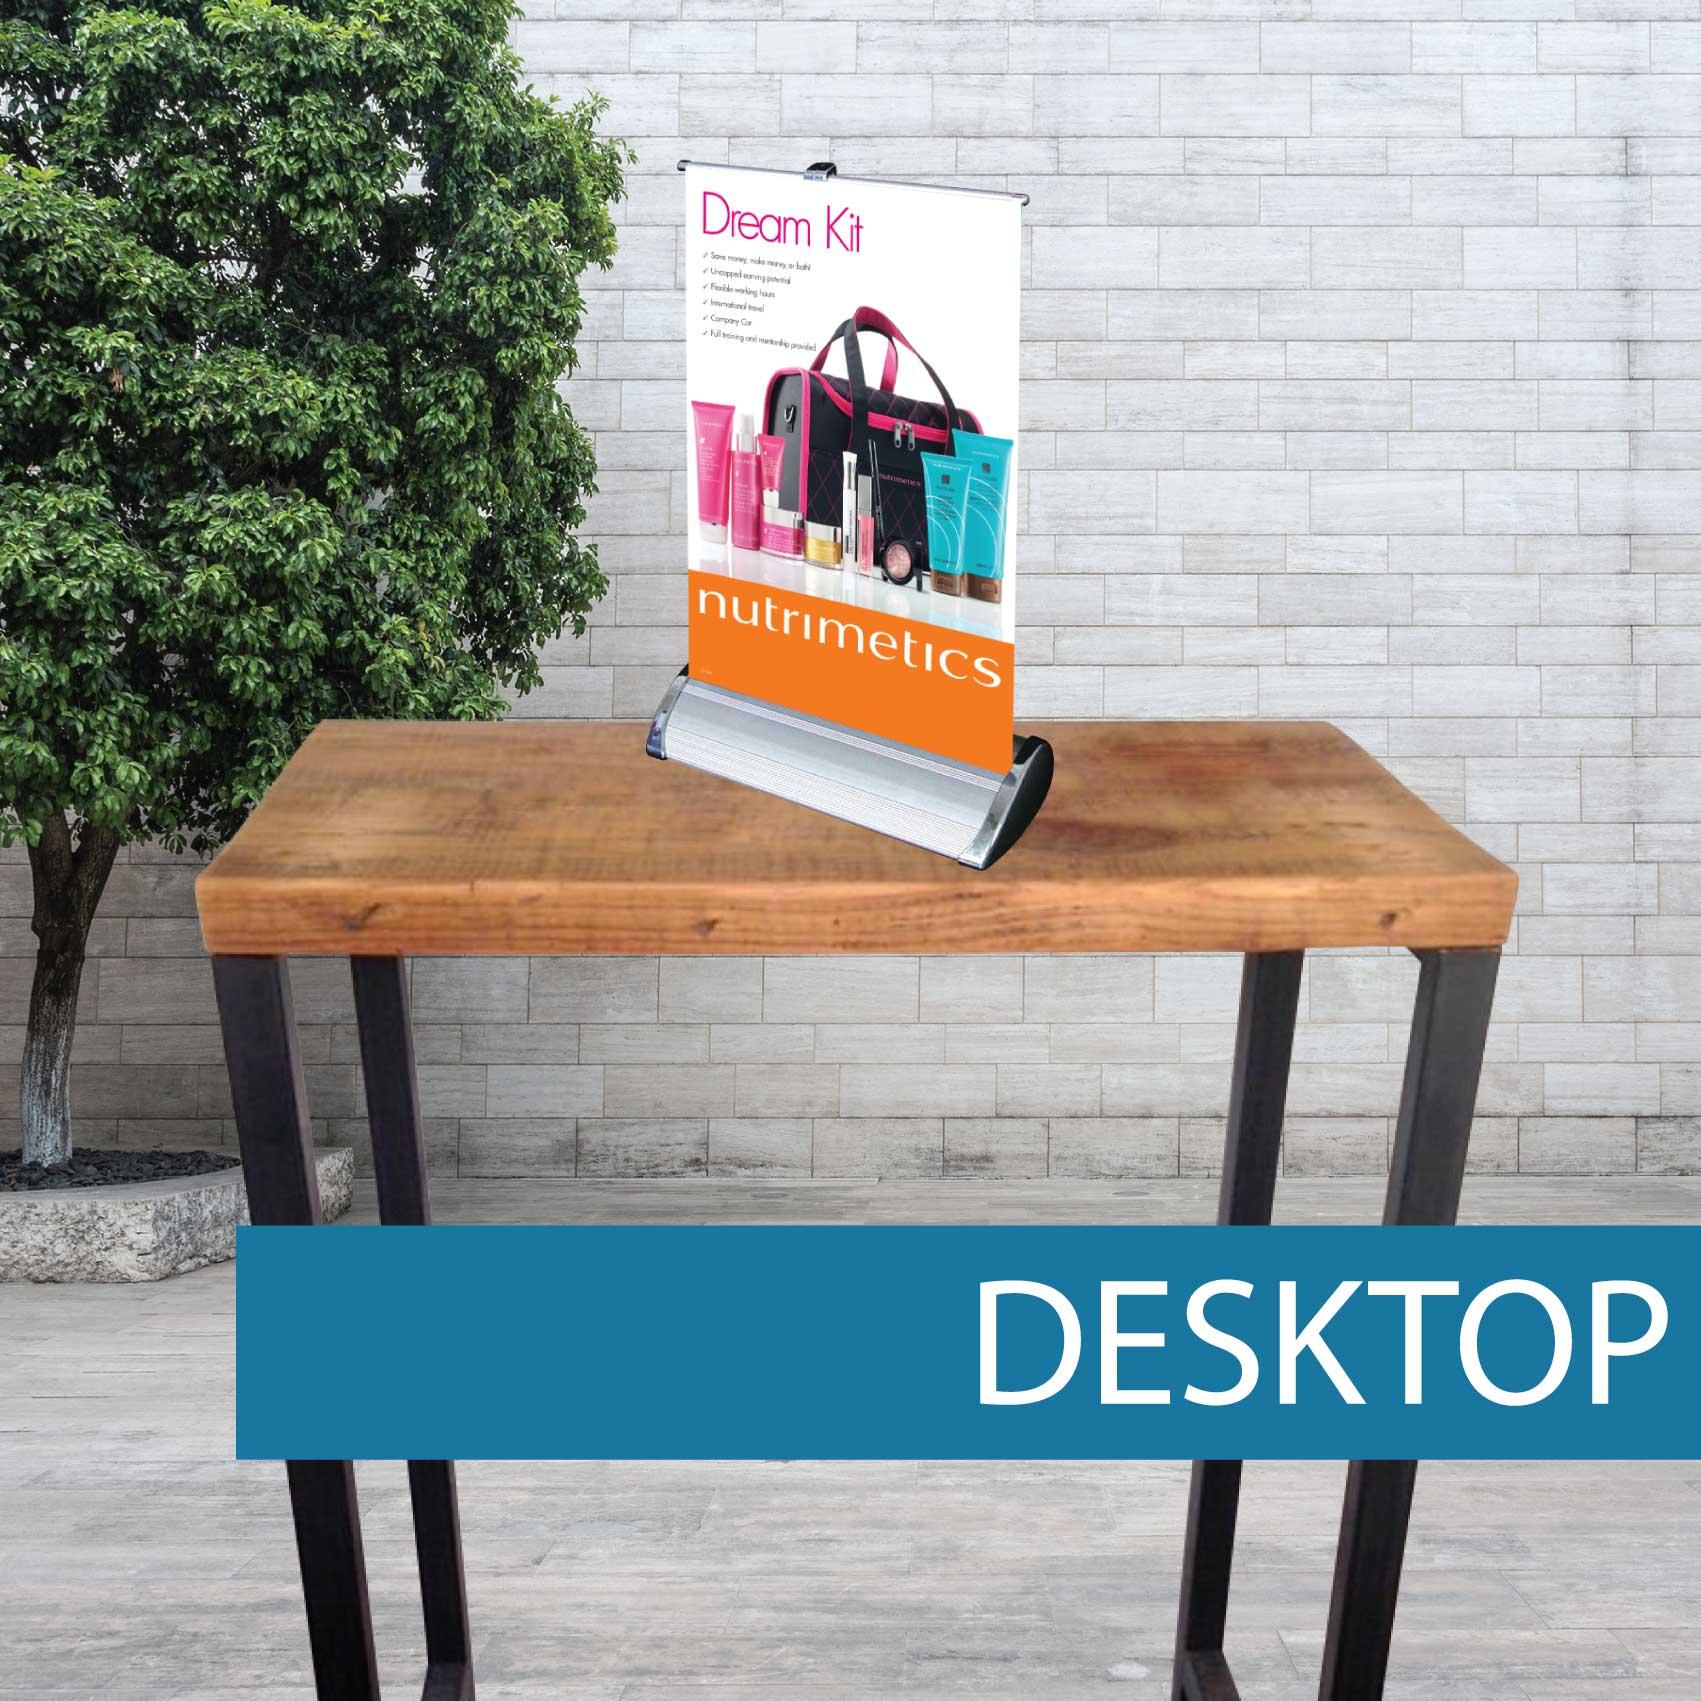 Desktop pullup banner